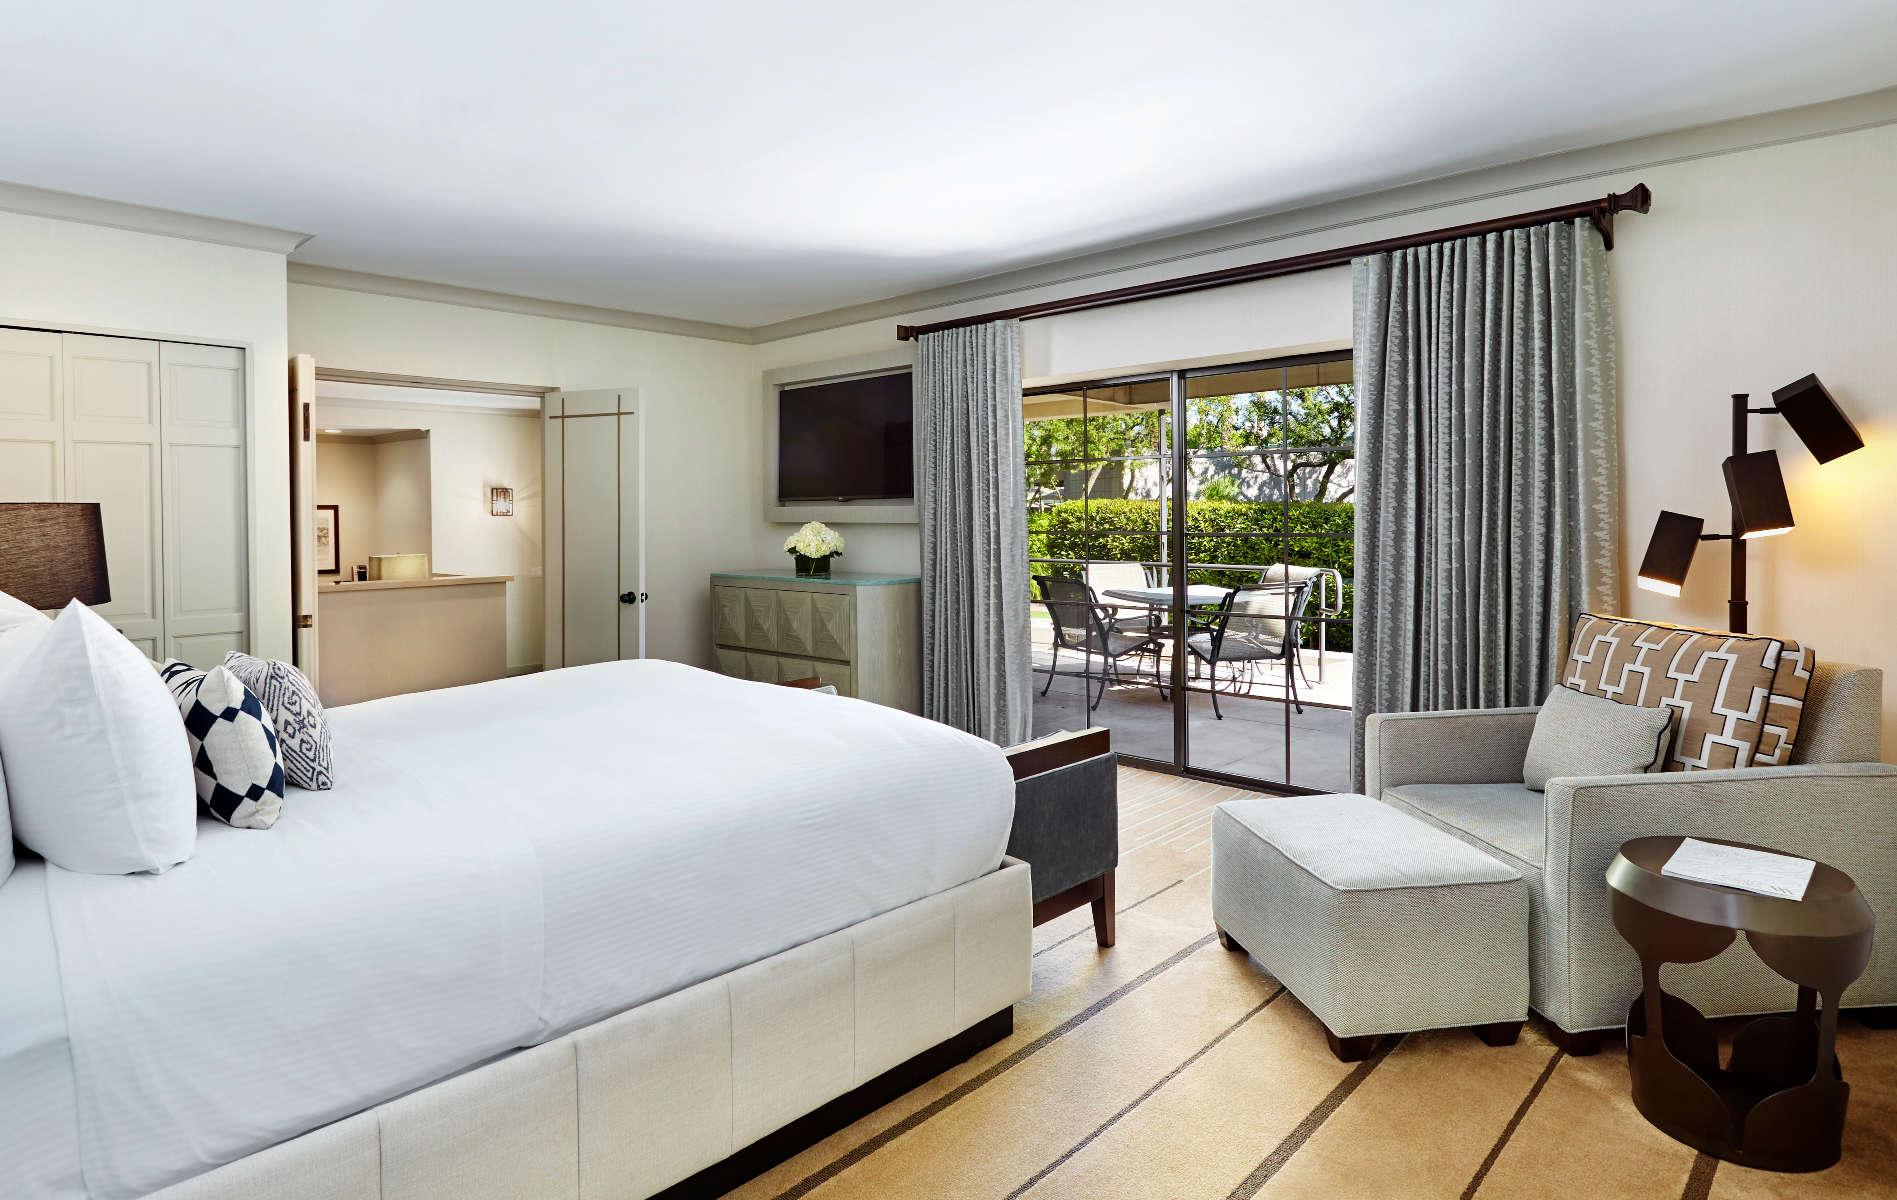 Luxury vacation rentals usa - Arizona - Phoenix - Arizona biltmore waldorf astoria - Presidential Suite - Image 1/11